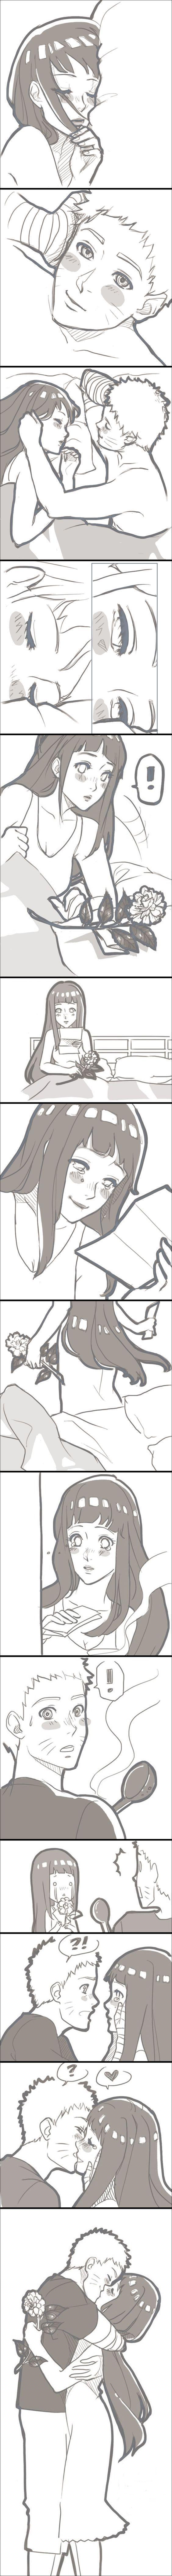 I really love Sasuke and Sakura, but I can't help admit that I love Naruto and Hinata just as much